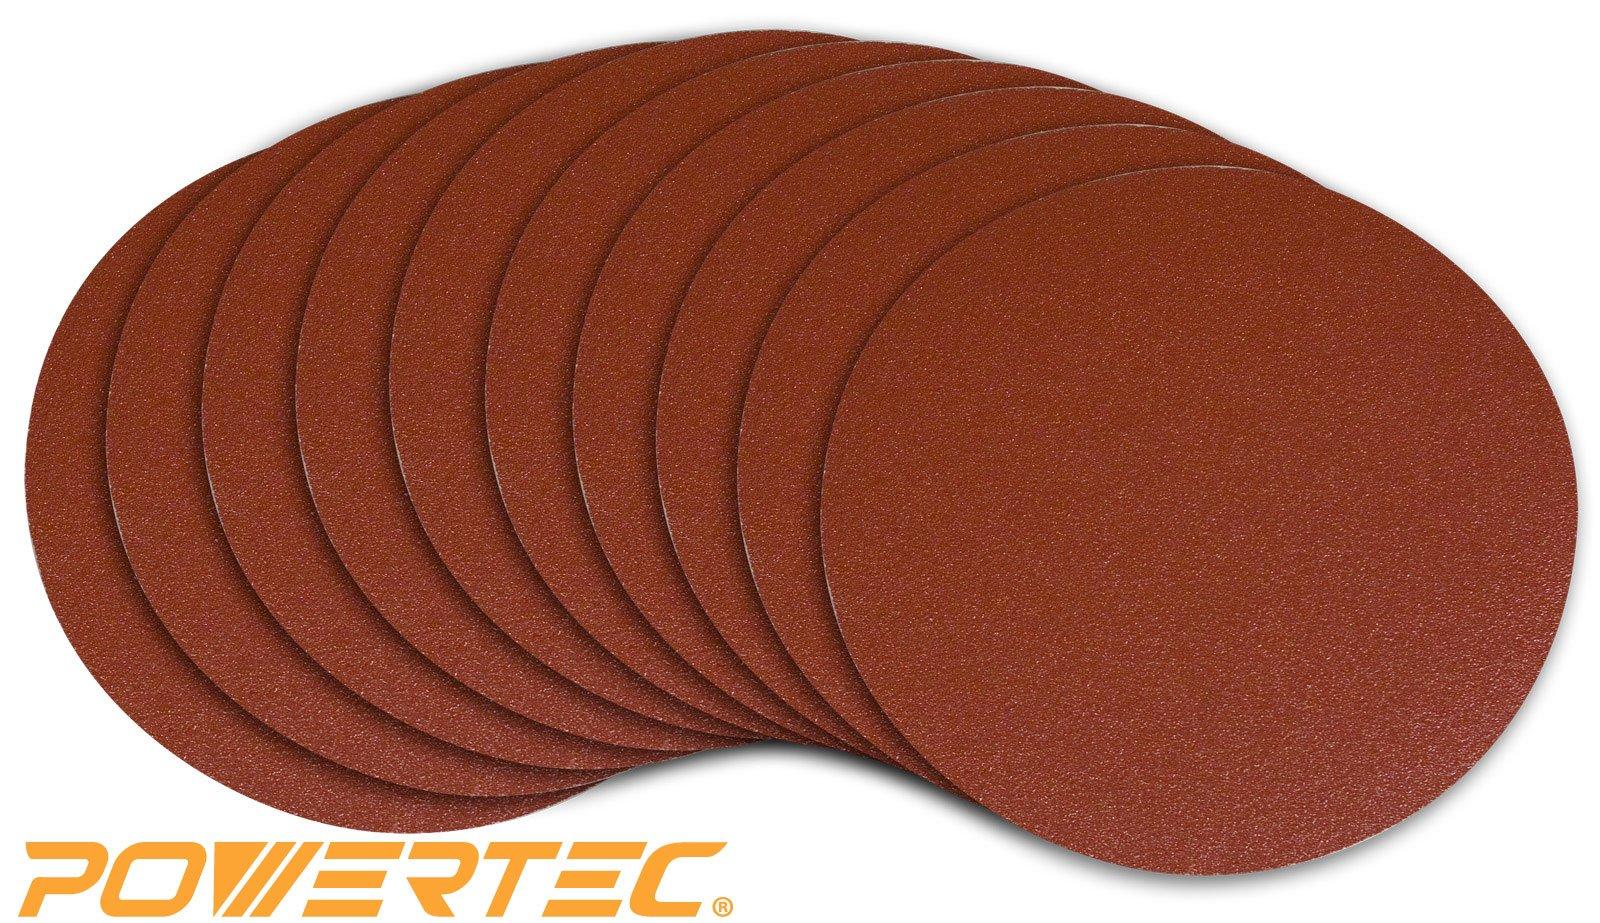 POWERTEC 110580 9-Inch PSA 80 Grit Aluminum Oxide Sanding Disc, Self Stick, 10-Pack by POWERTEC